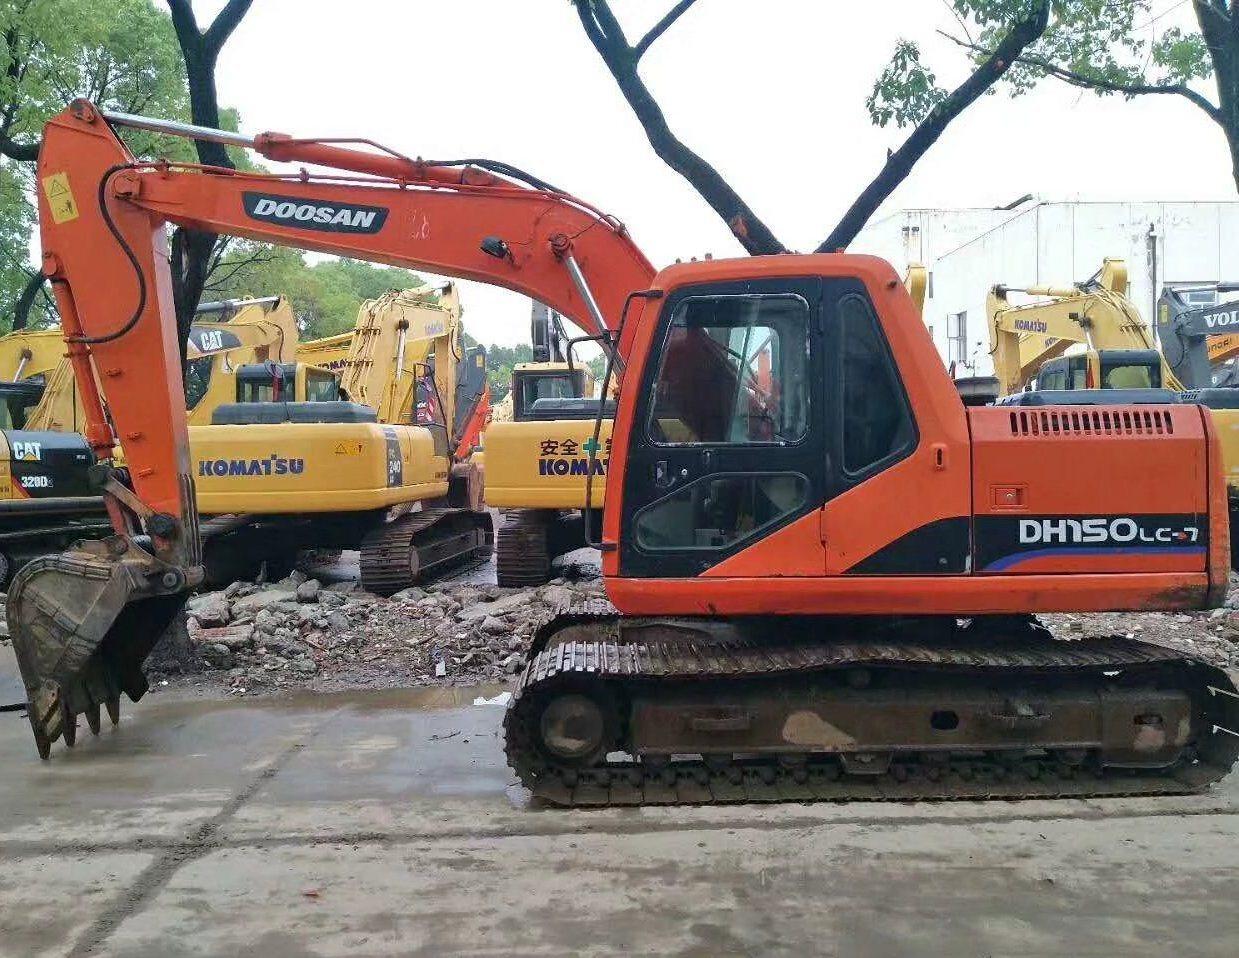 Doosan DH150LC-7